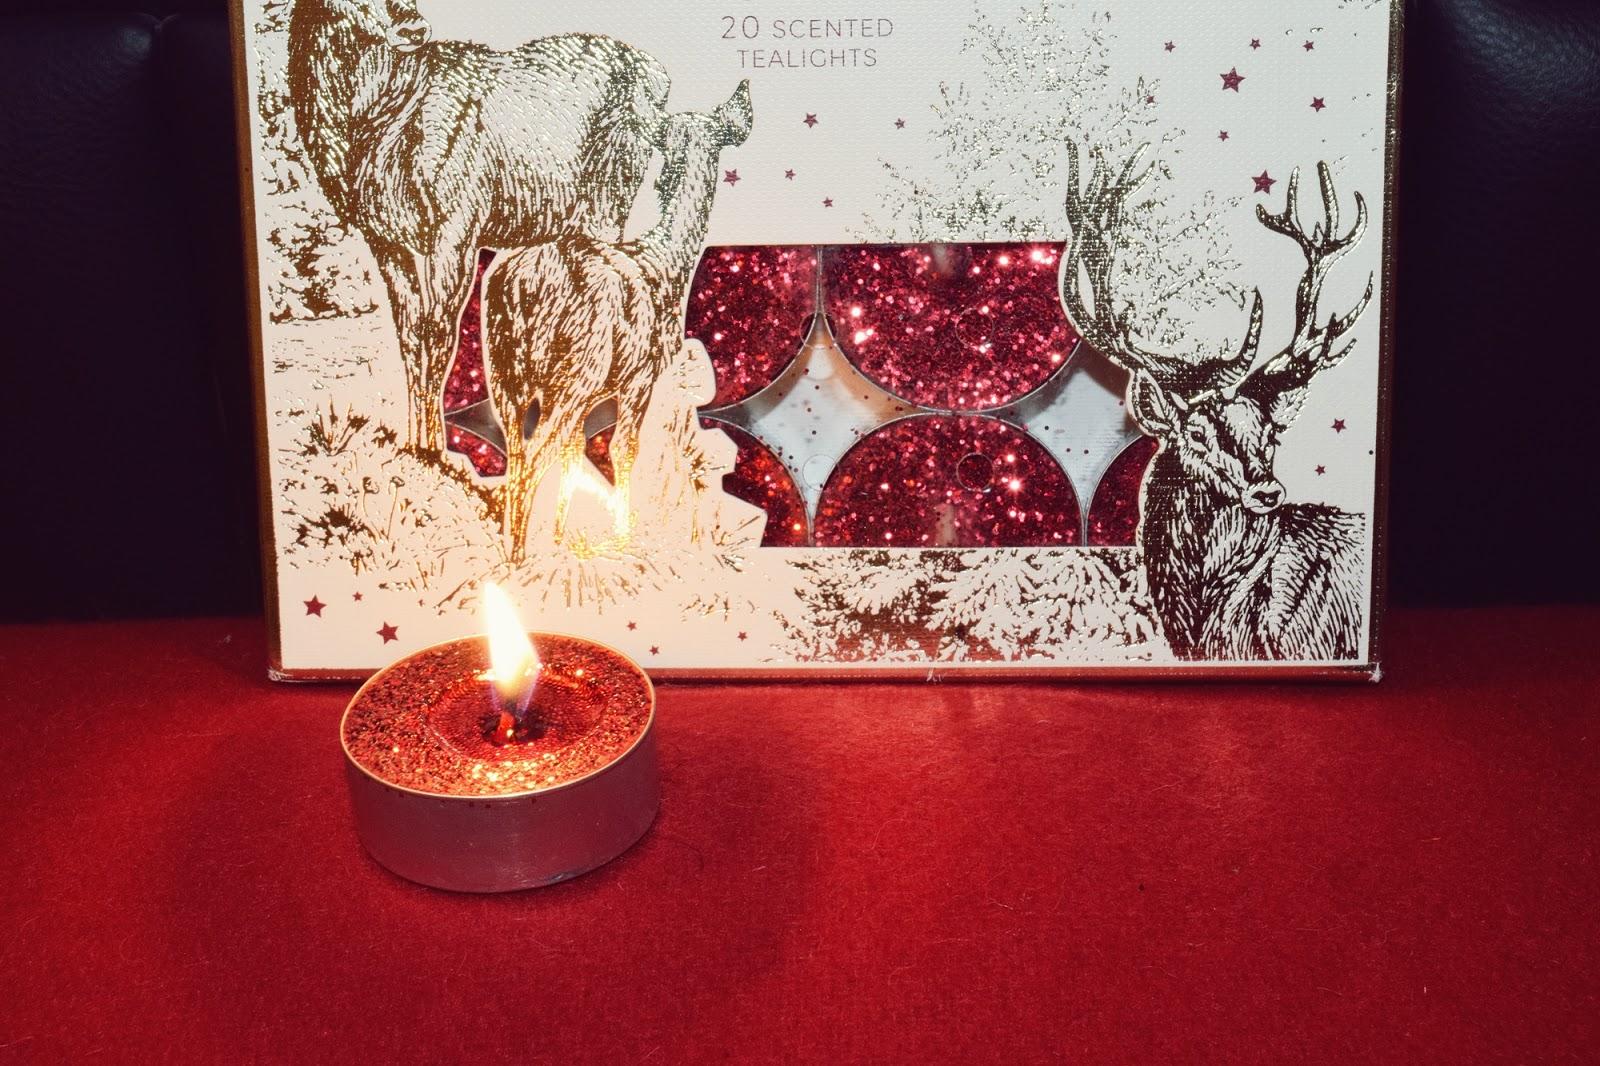 Mandarin, Clove & Cinnamon Scented Glitter Tealights